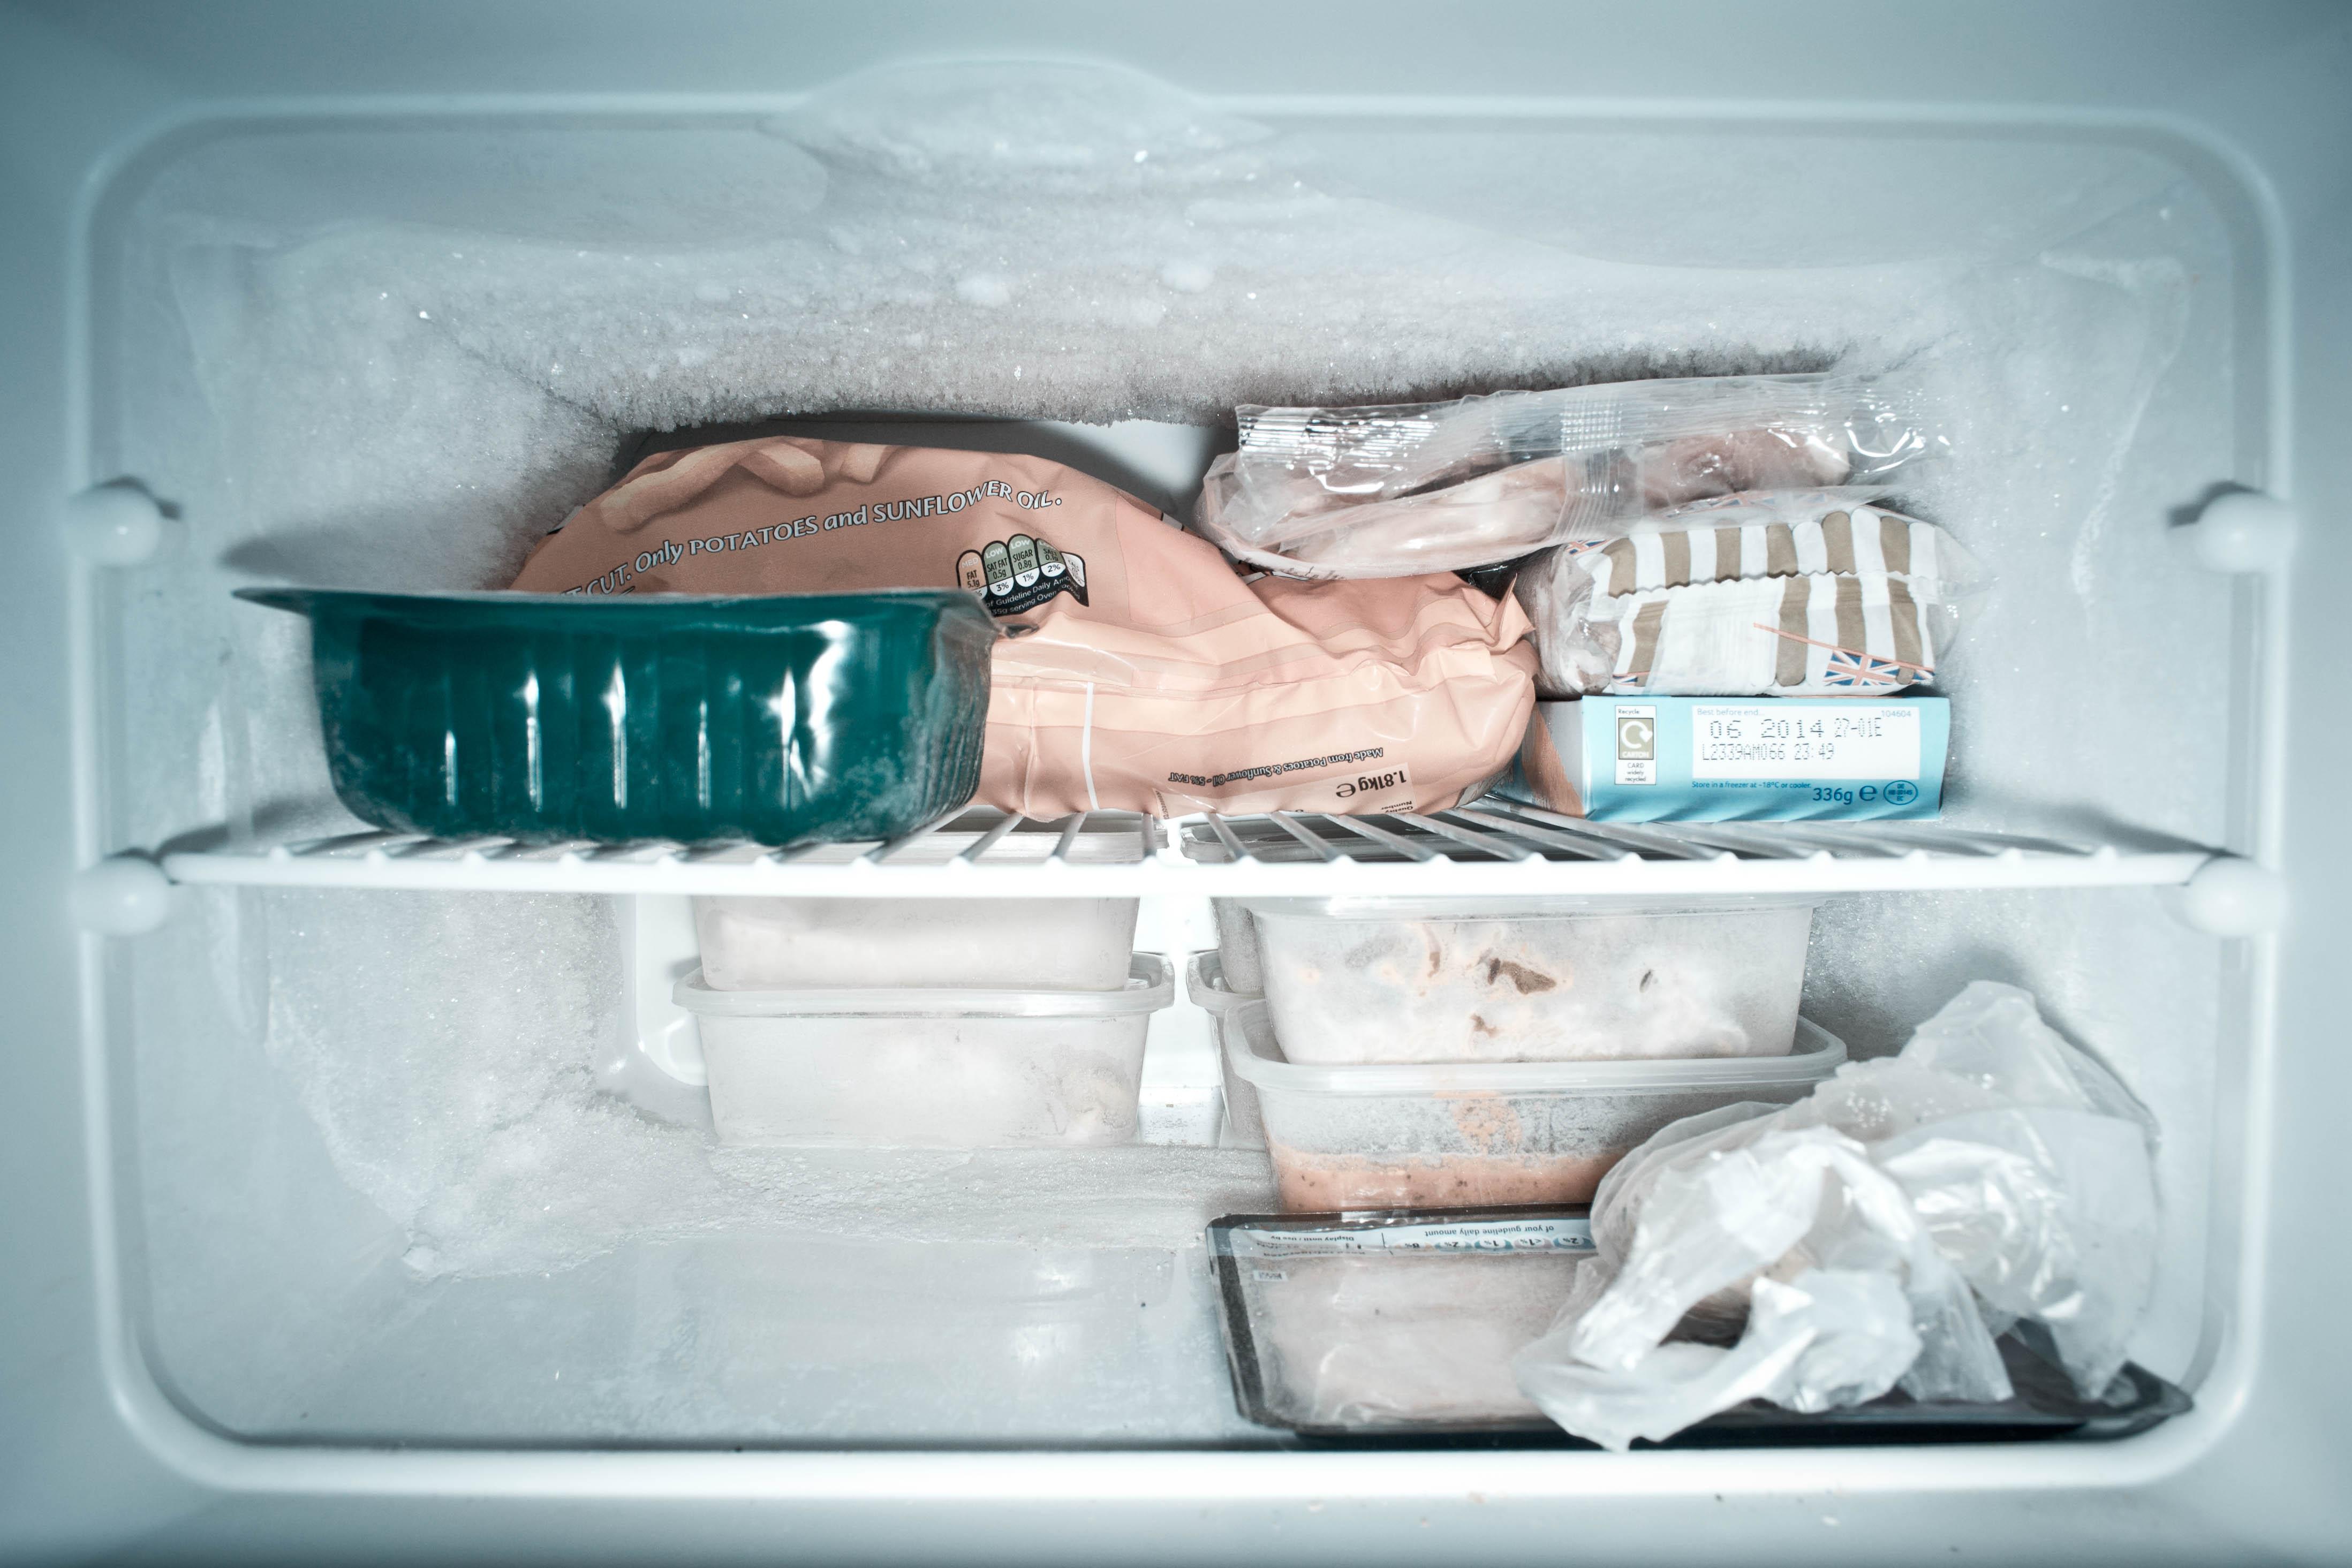 018/365 2.0 - Freezer